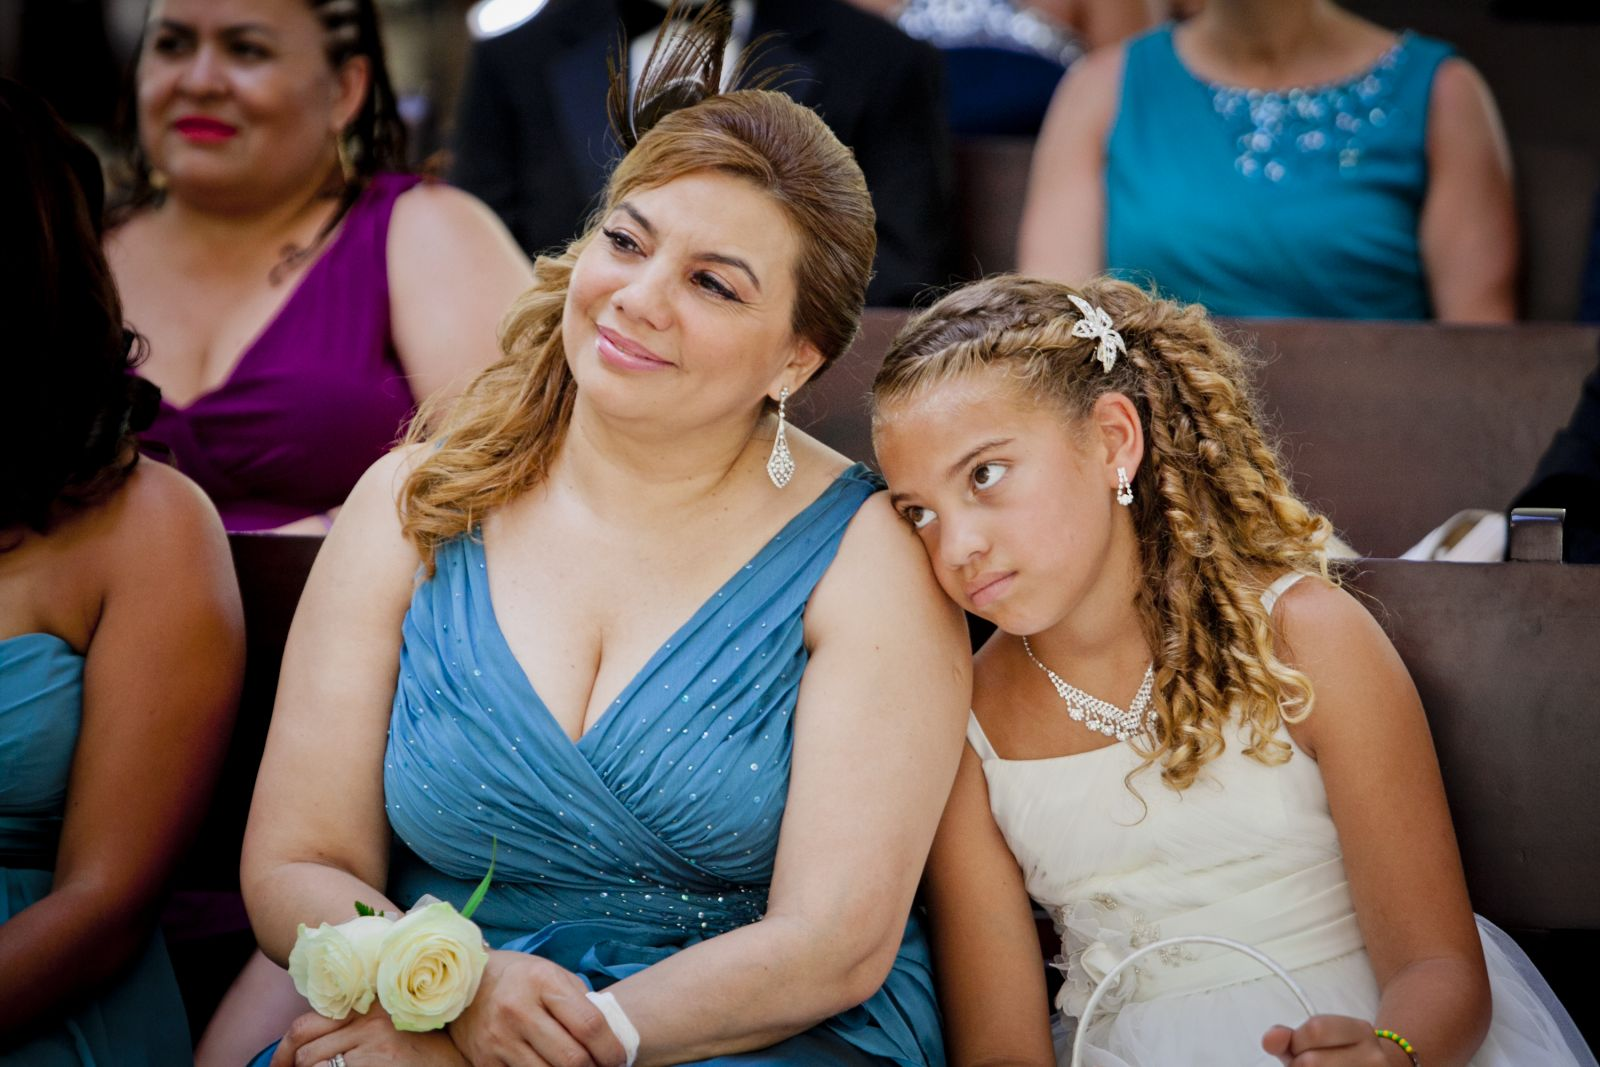 My proud mom and my bored niece hahaha